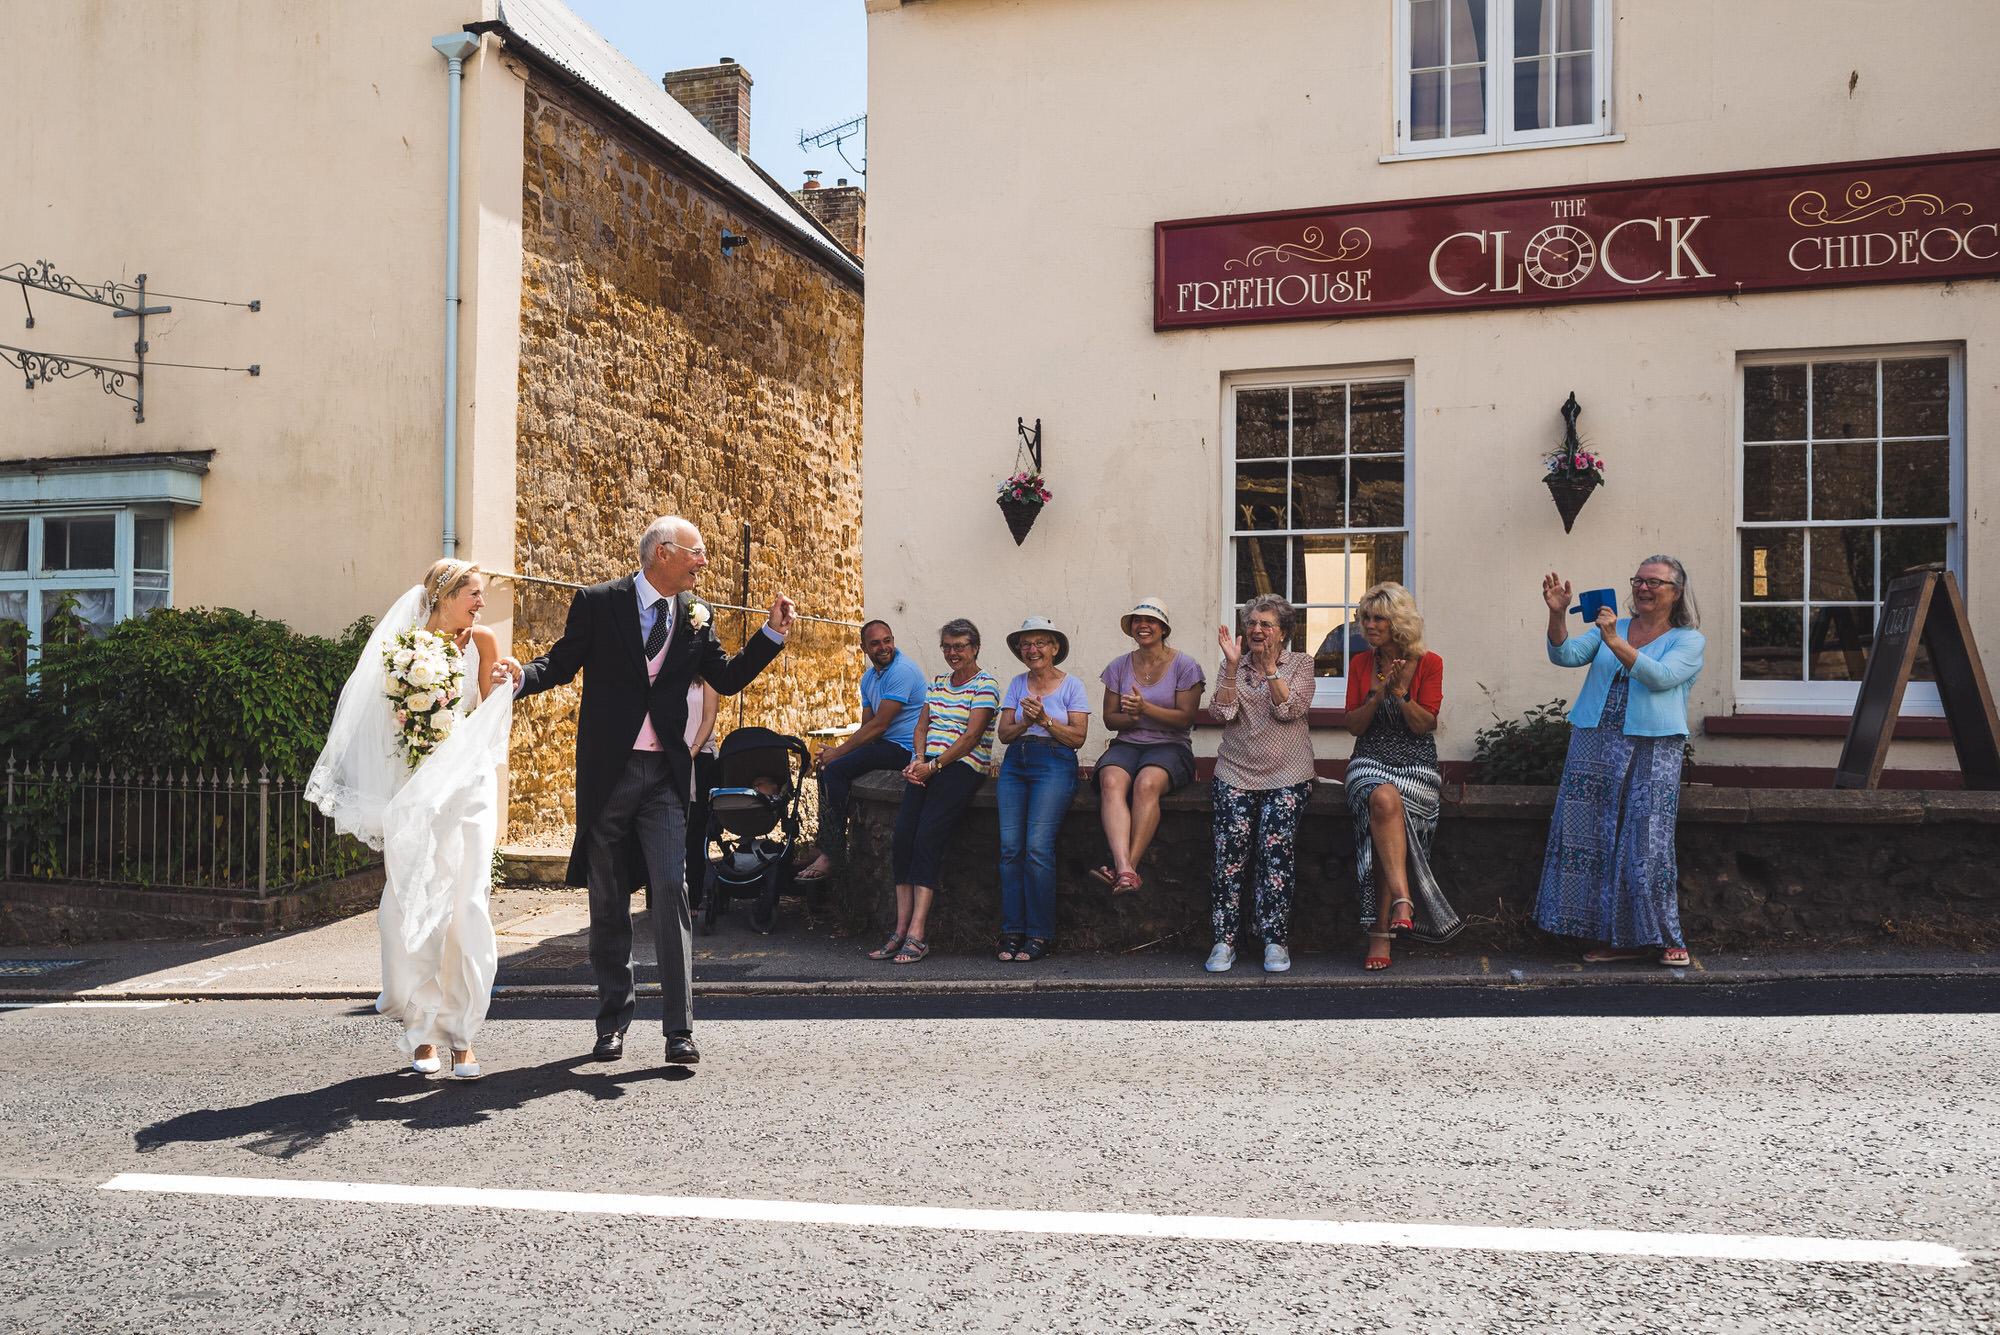 Dorset marquee wedding by the sea simon biffen photography 13